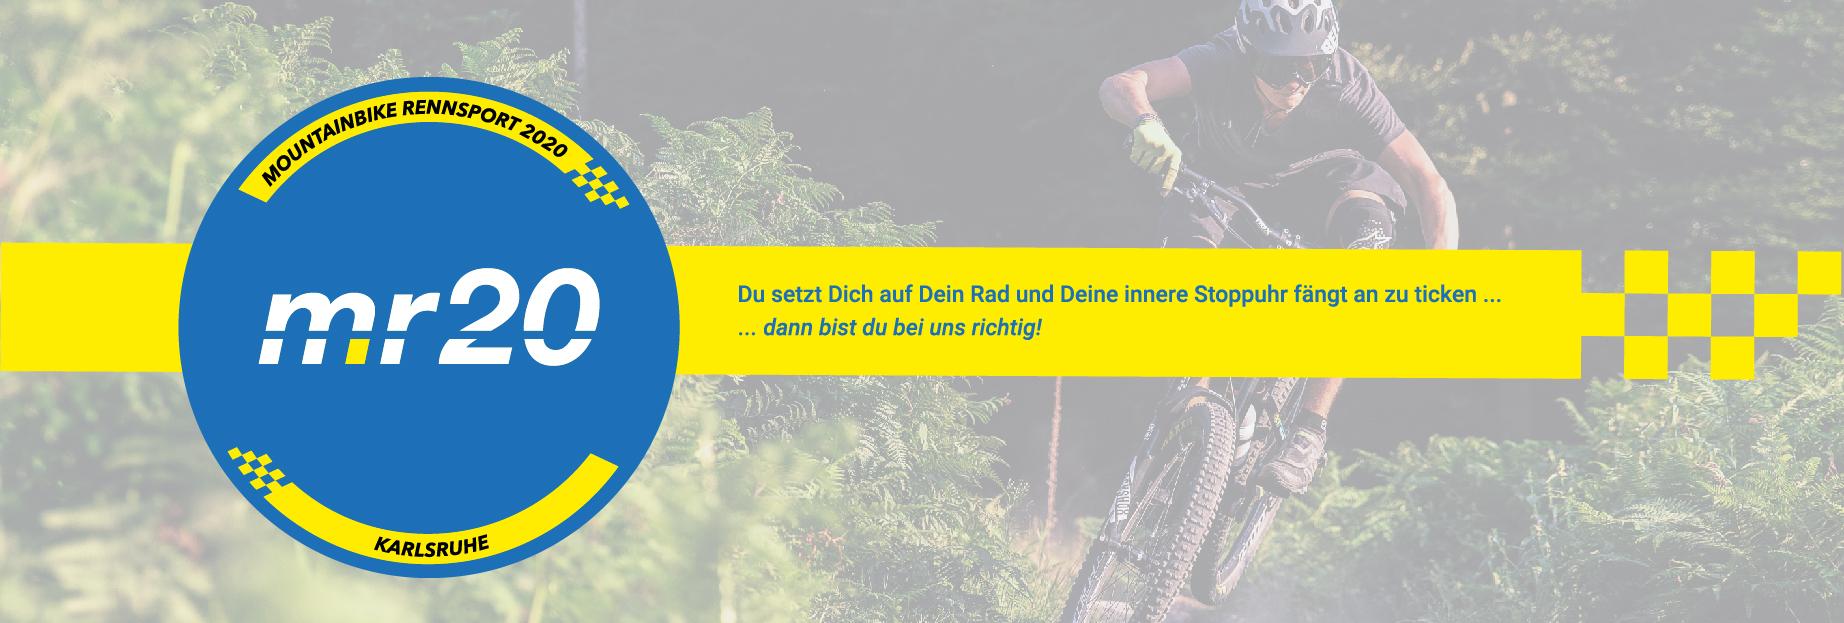 mr20 -Mountainbike Rennsport 2020 in  Karlsruhe